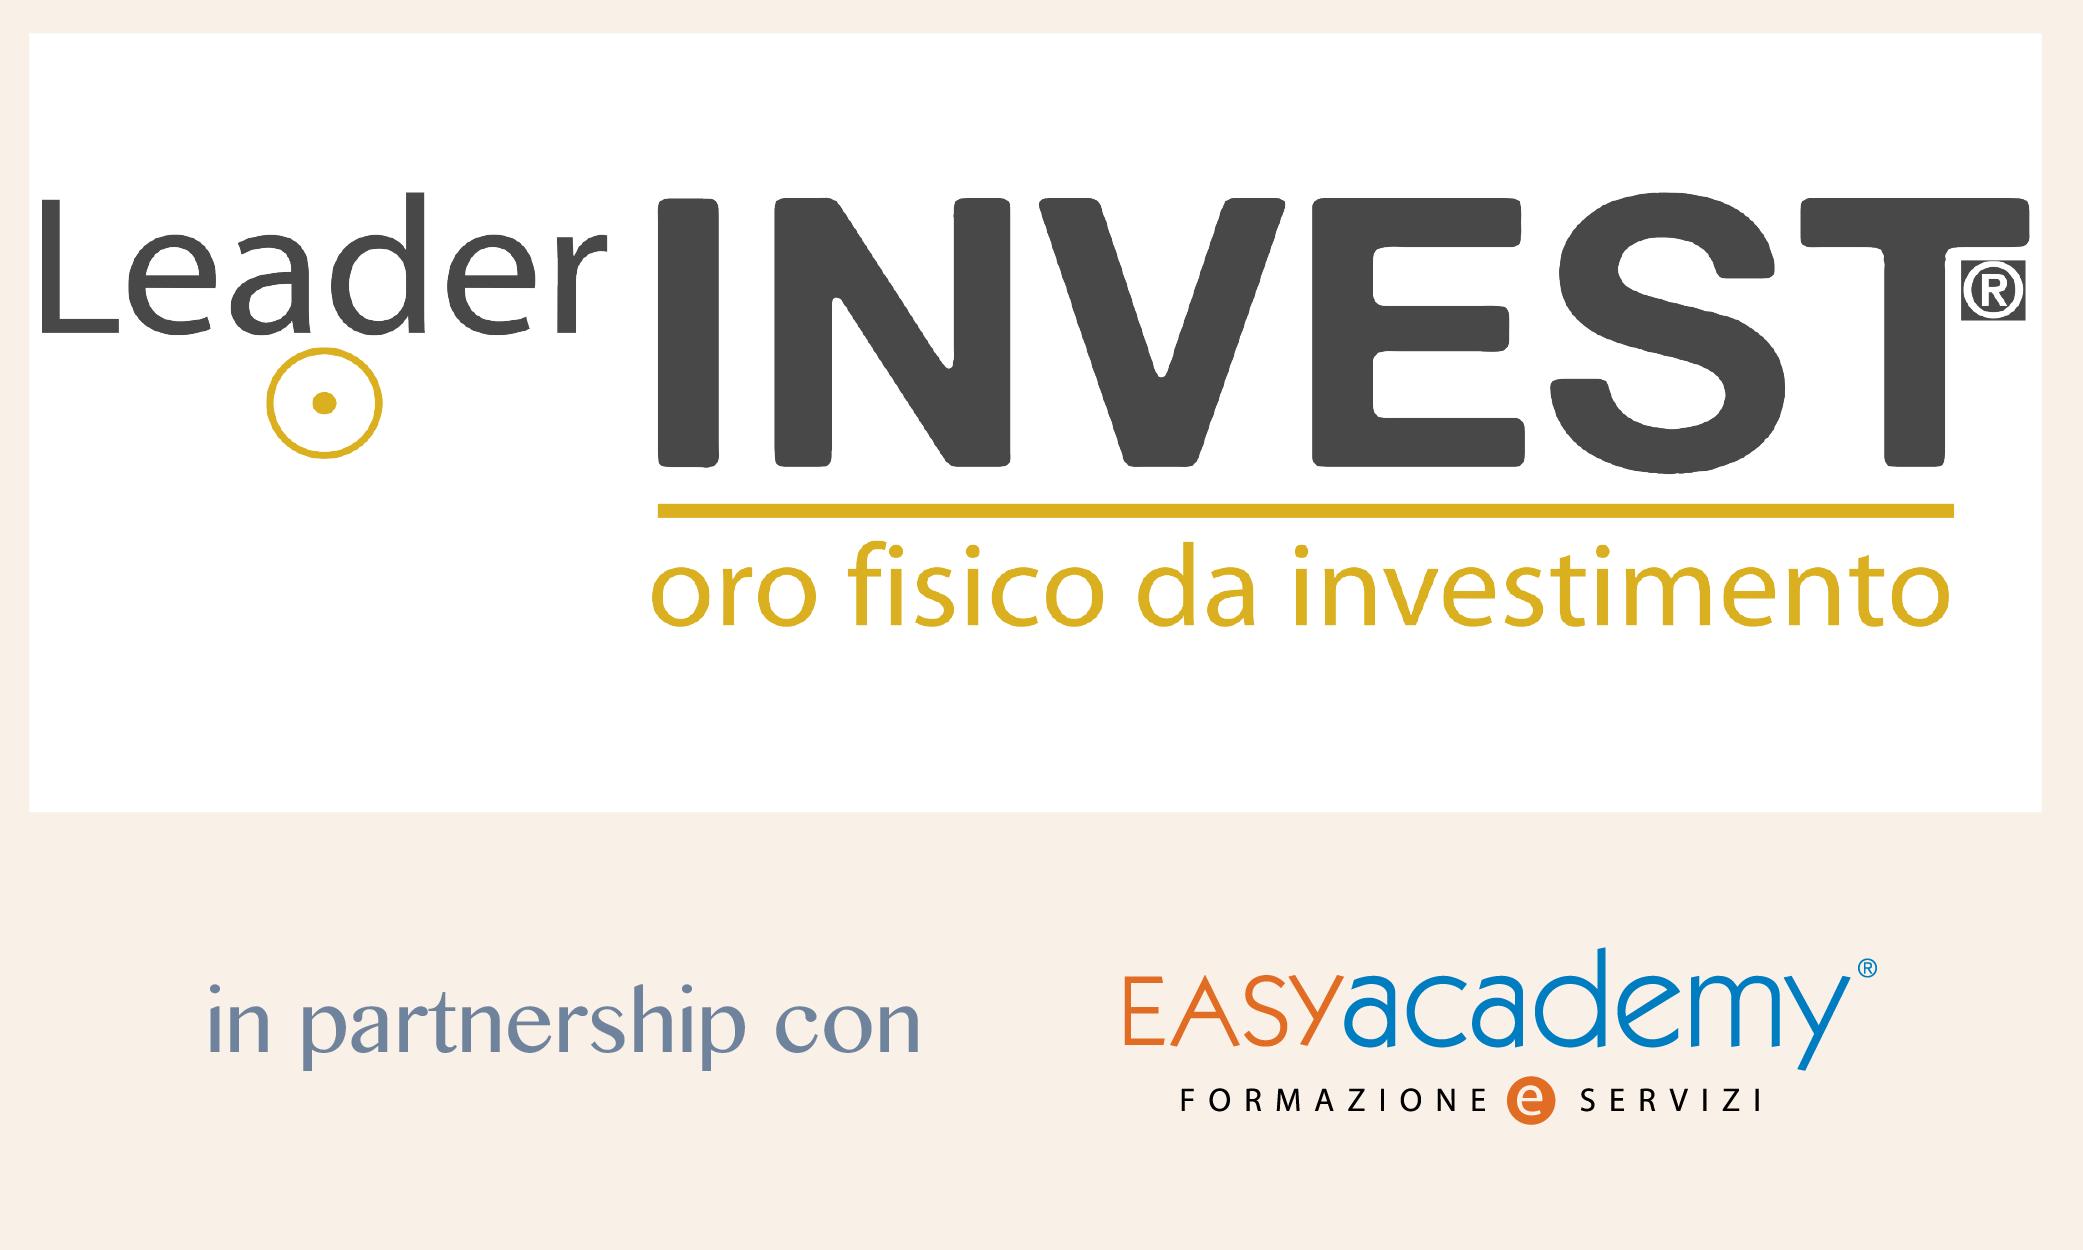 Leadr Invest - Easyacademy